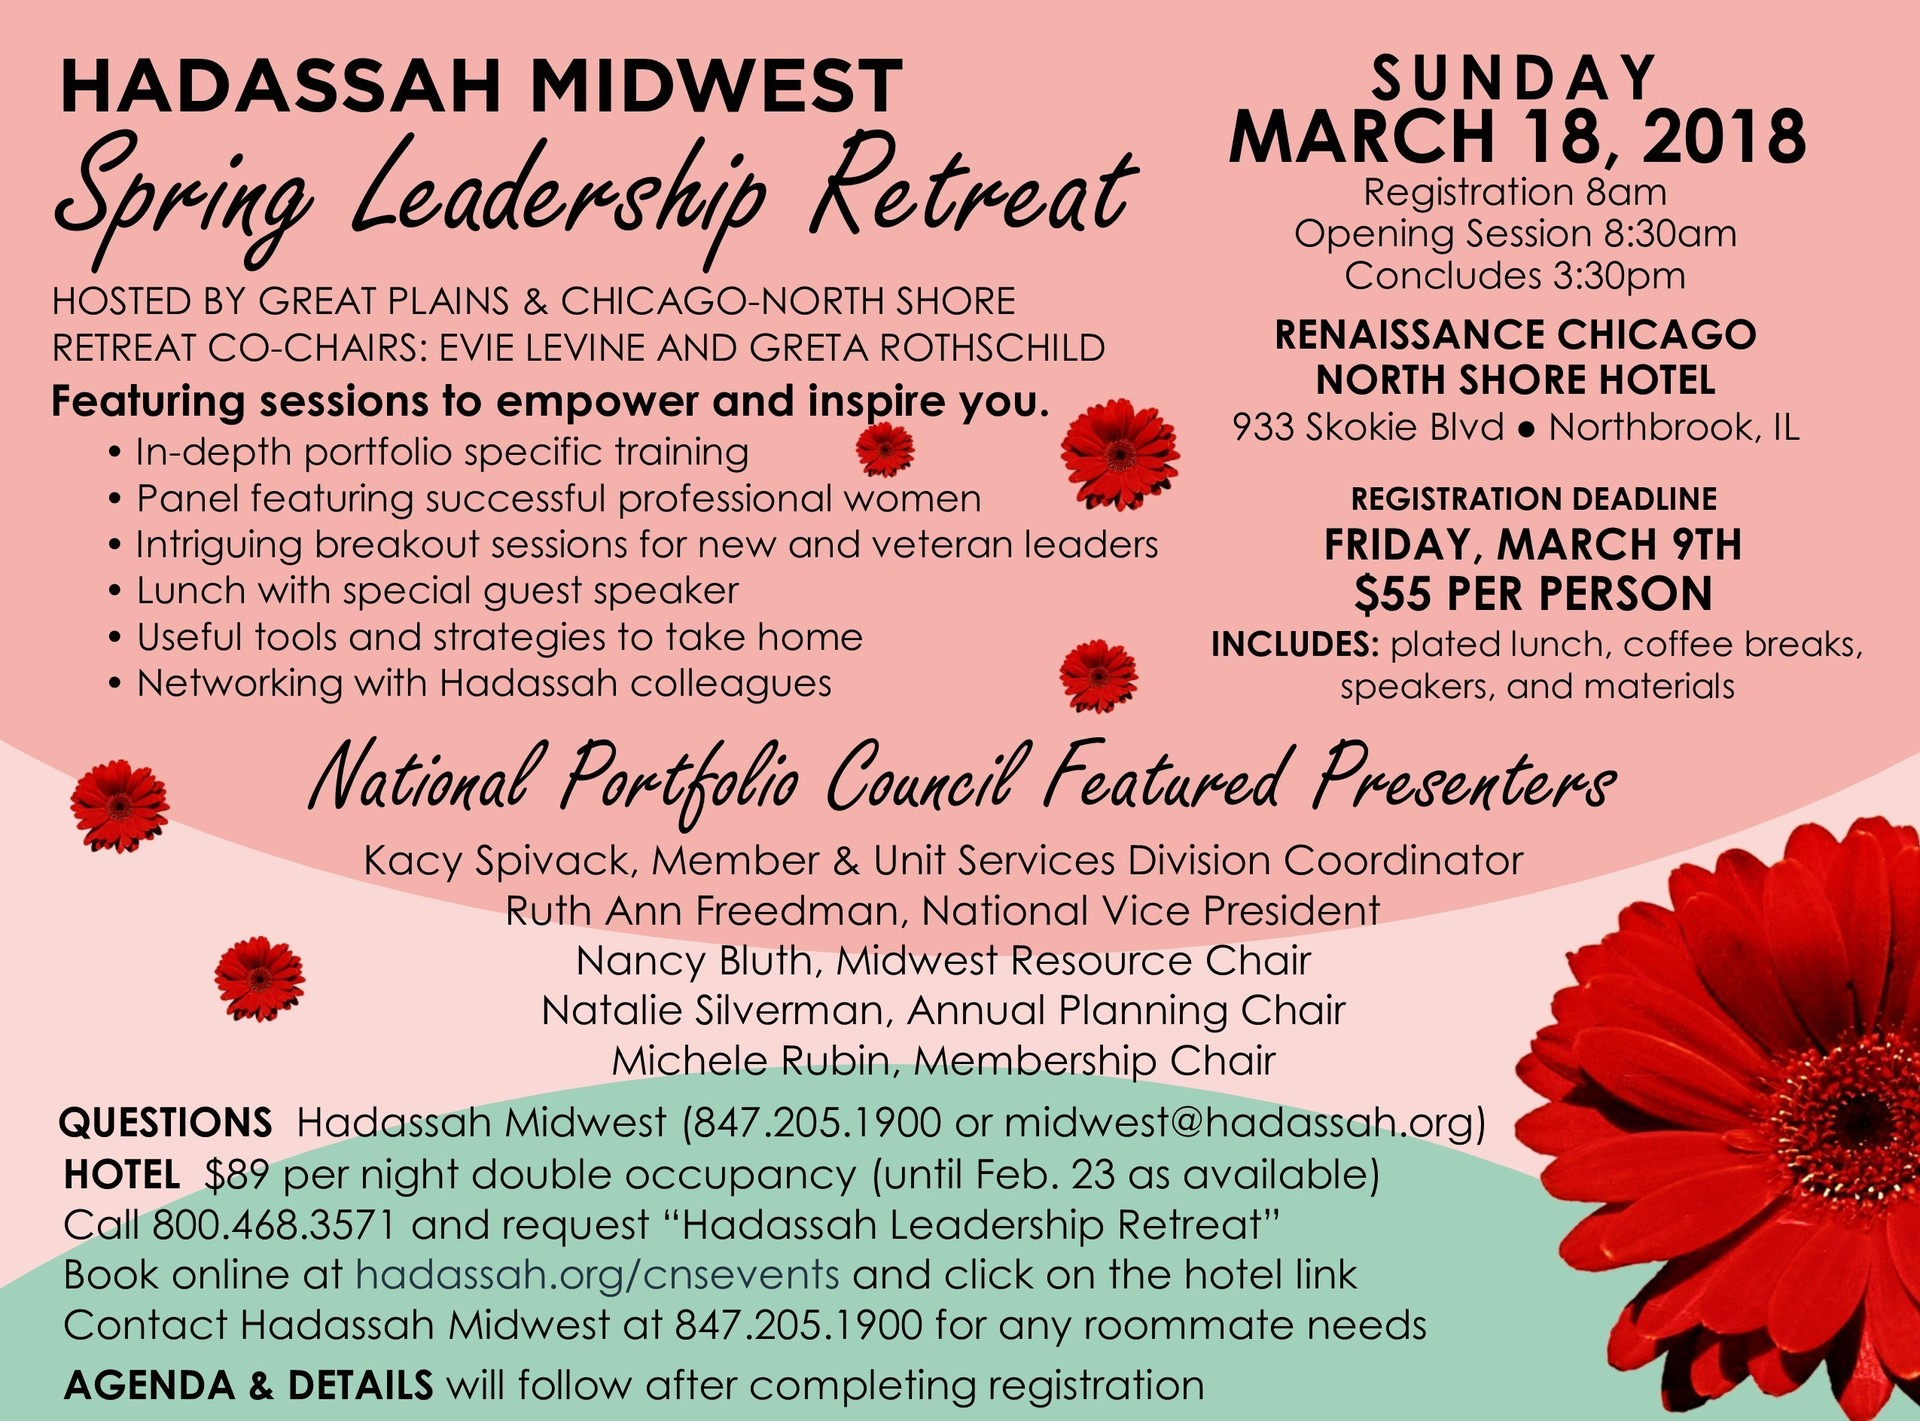 News from Hadassah Chicago-North Shore